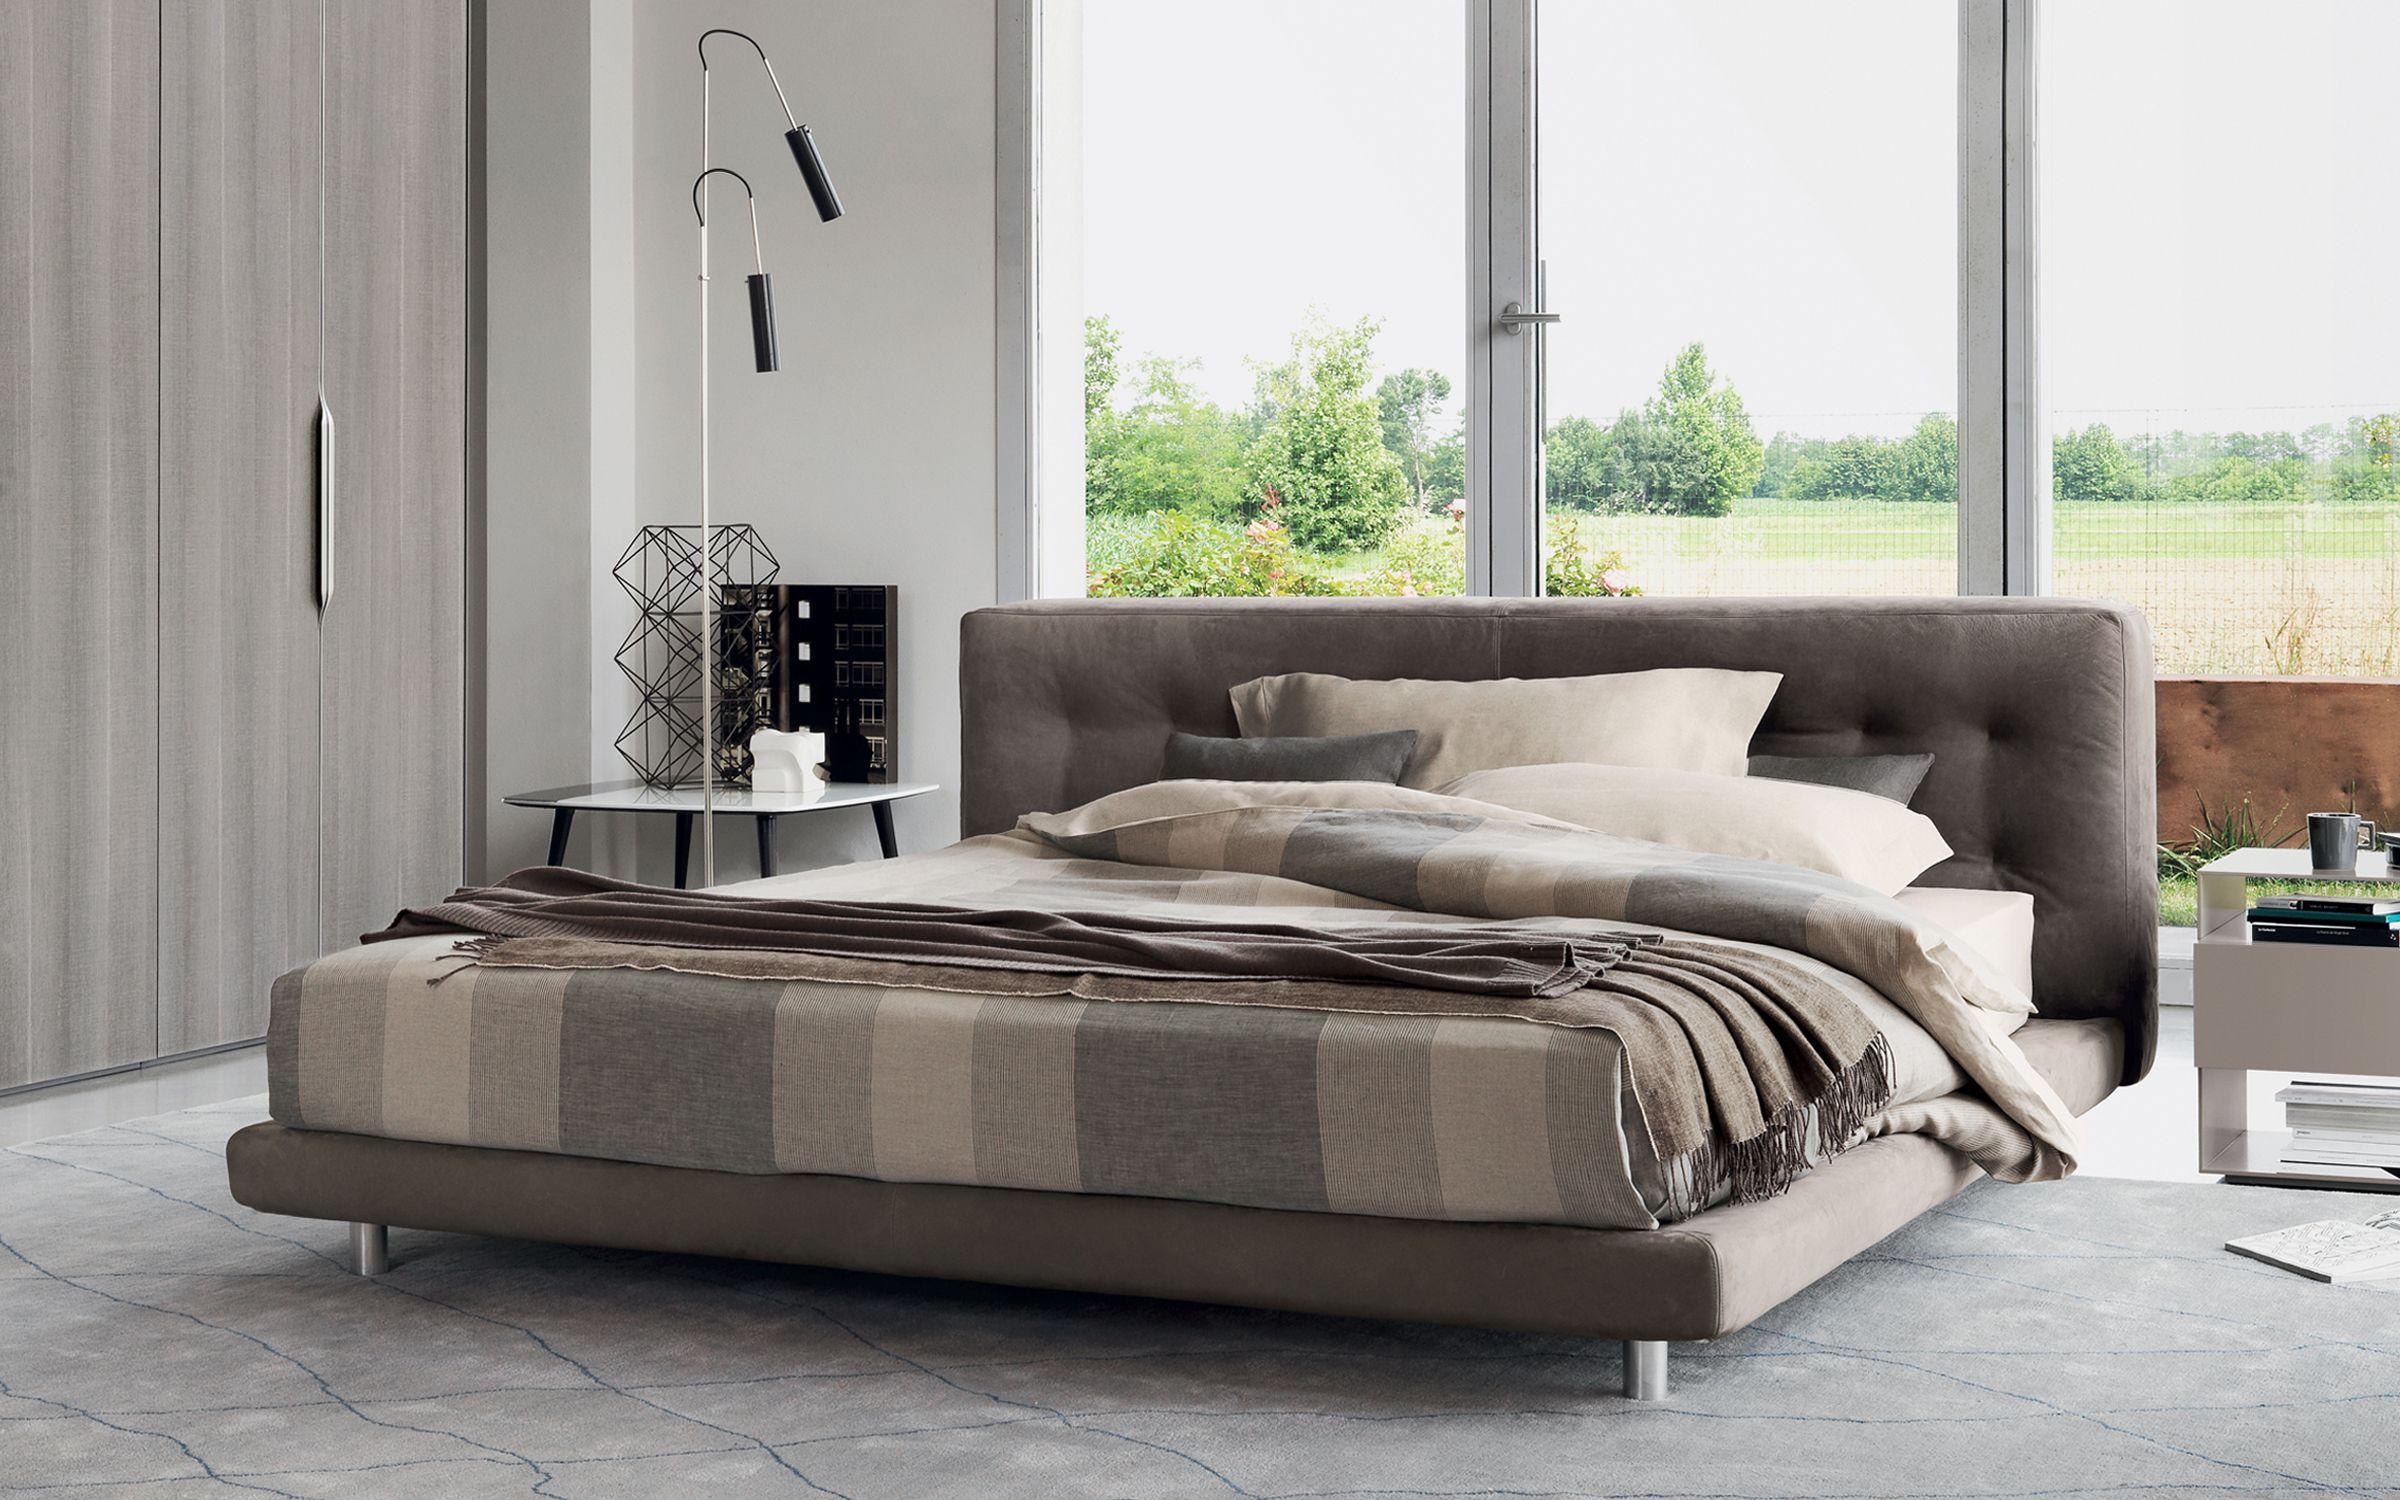 Comfort, benessere ed eleganza senza tempo . Il nostro letto matrimoniale Doze    http://www.flou.it/it/products/beds/doze_94  Comfort and elegance. Our bed Doze  Design by Rodolfo Dordoni  #bed #beds #flou #homedecor #home #design #comfort